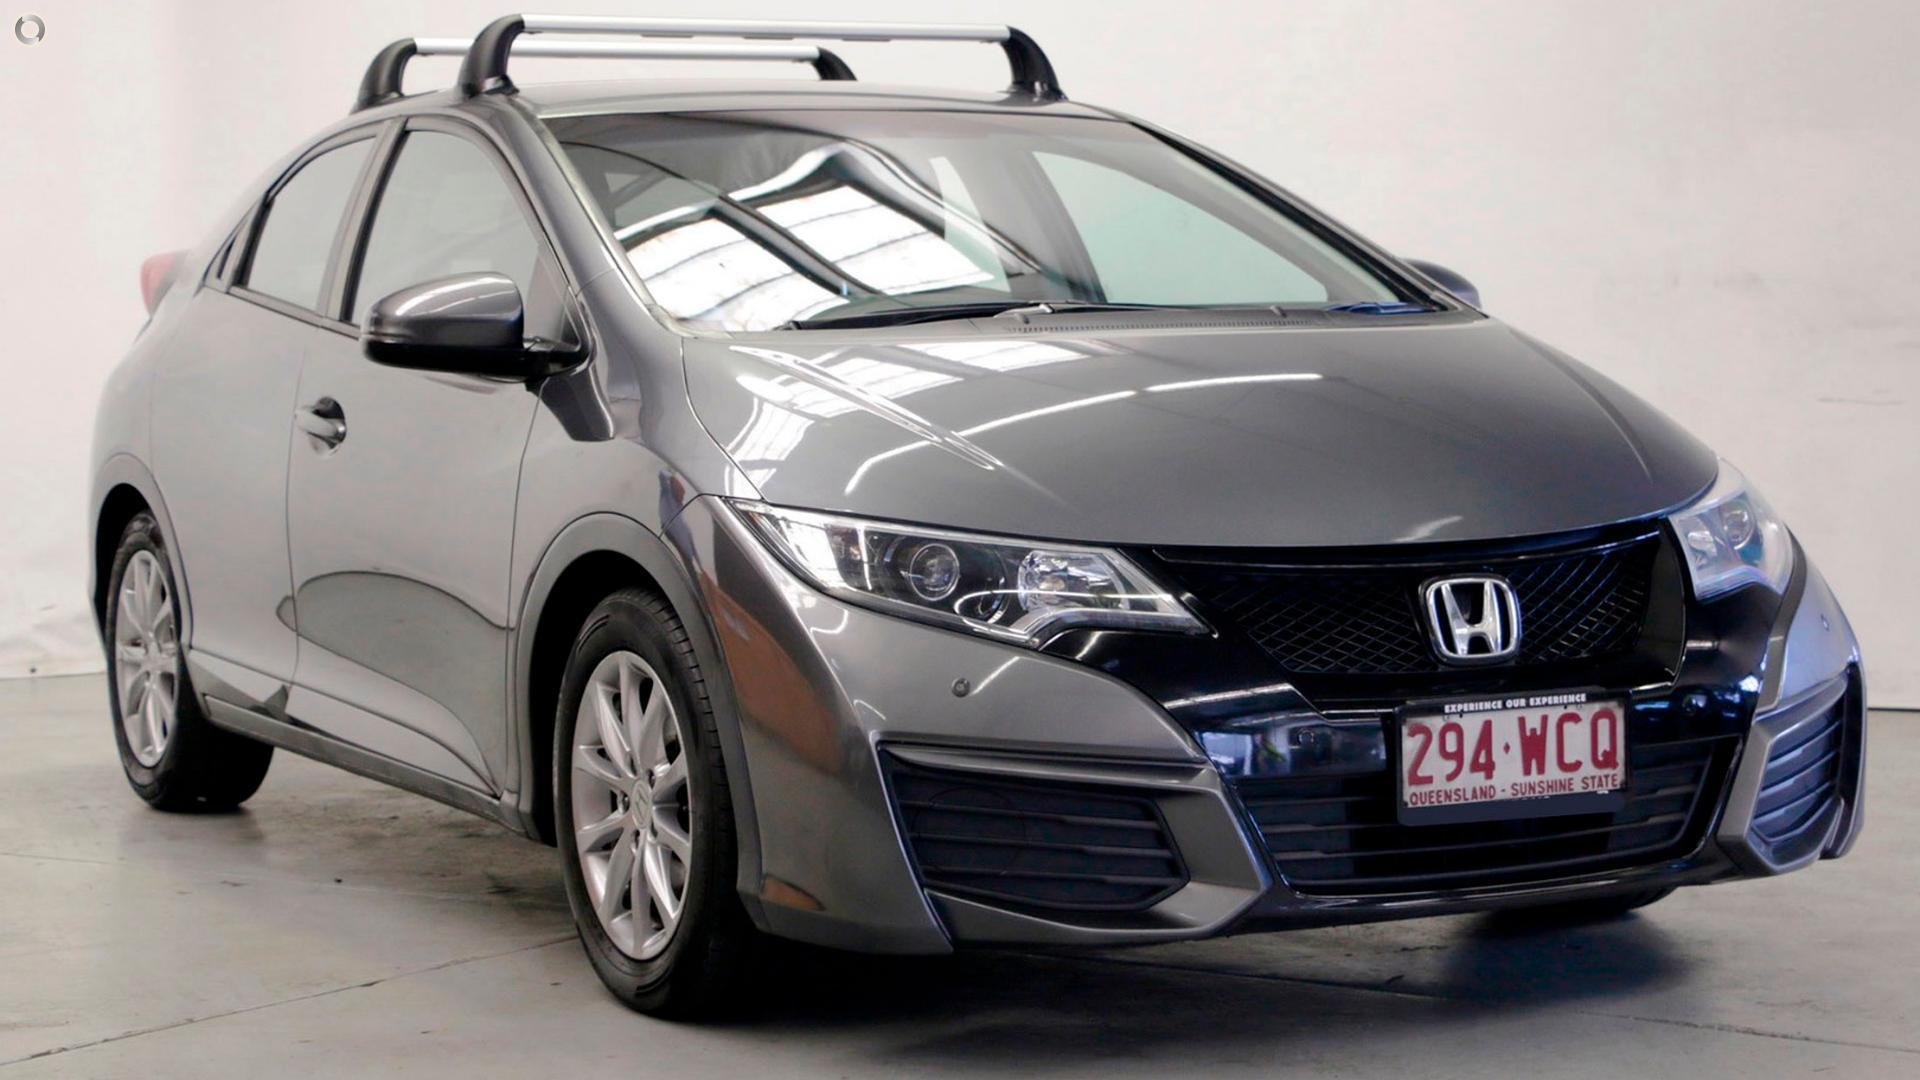 2015 Honda Civic 9th Gen